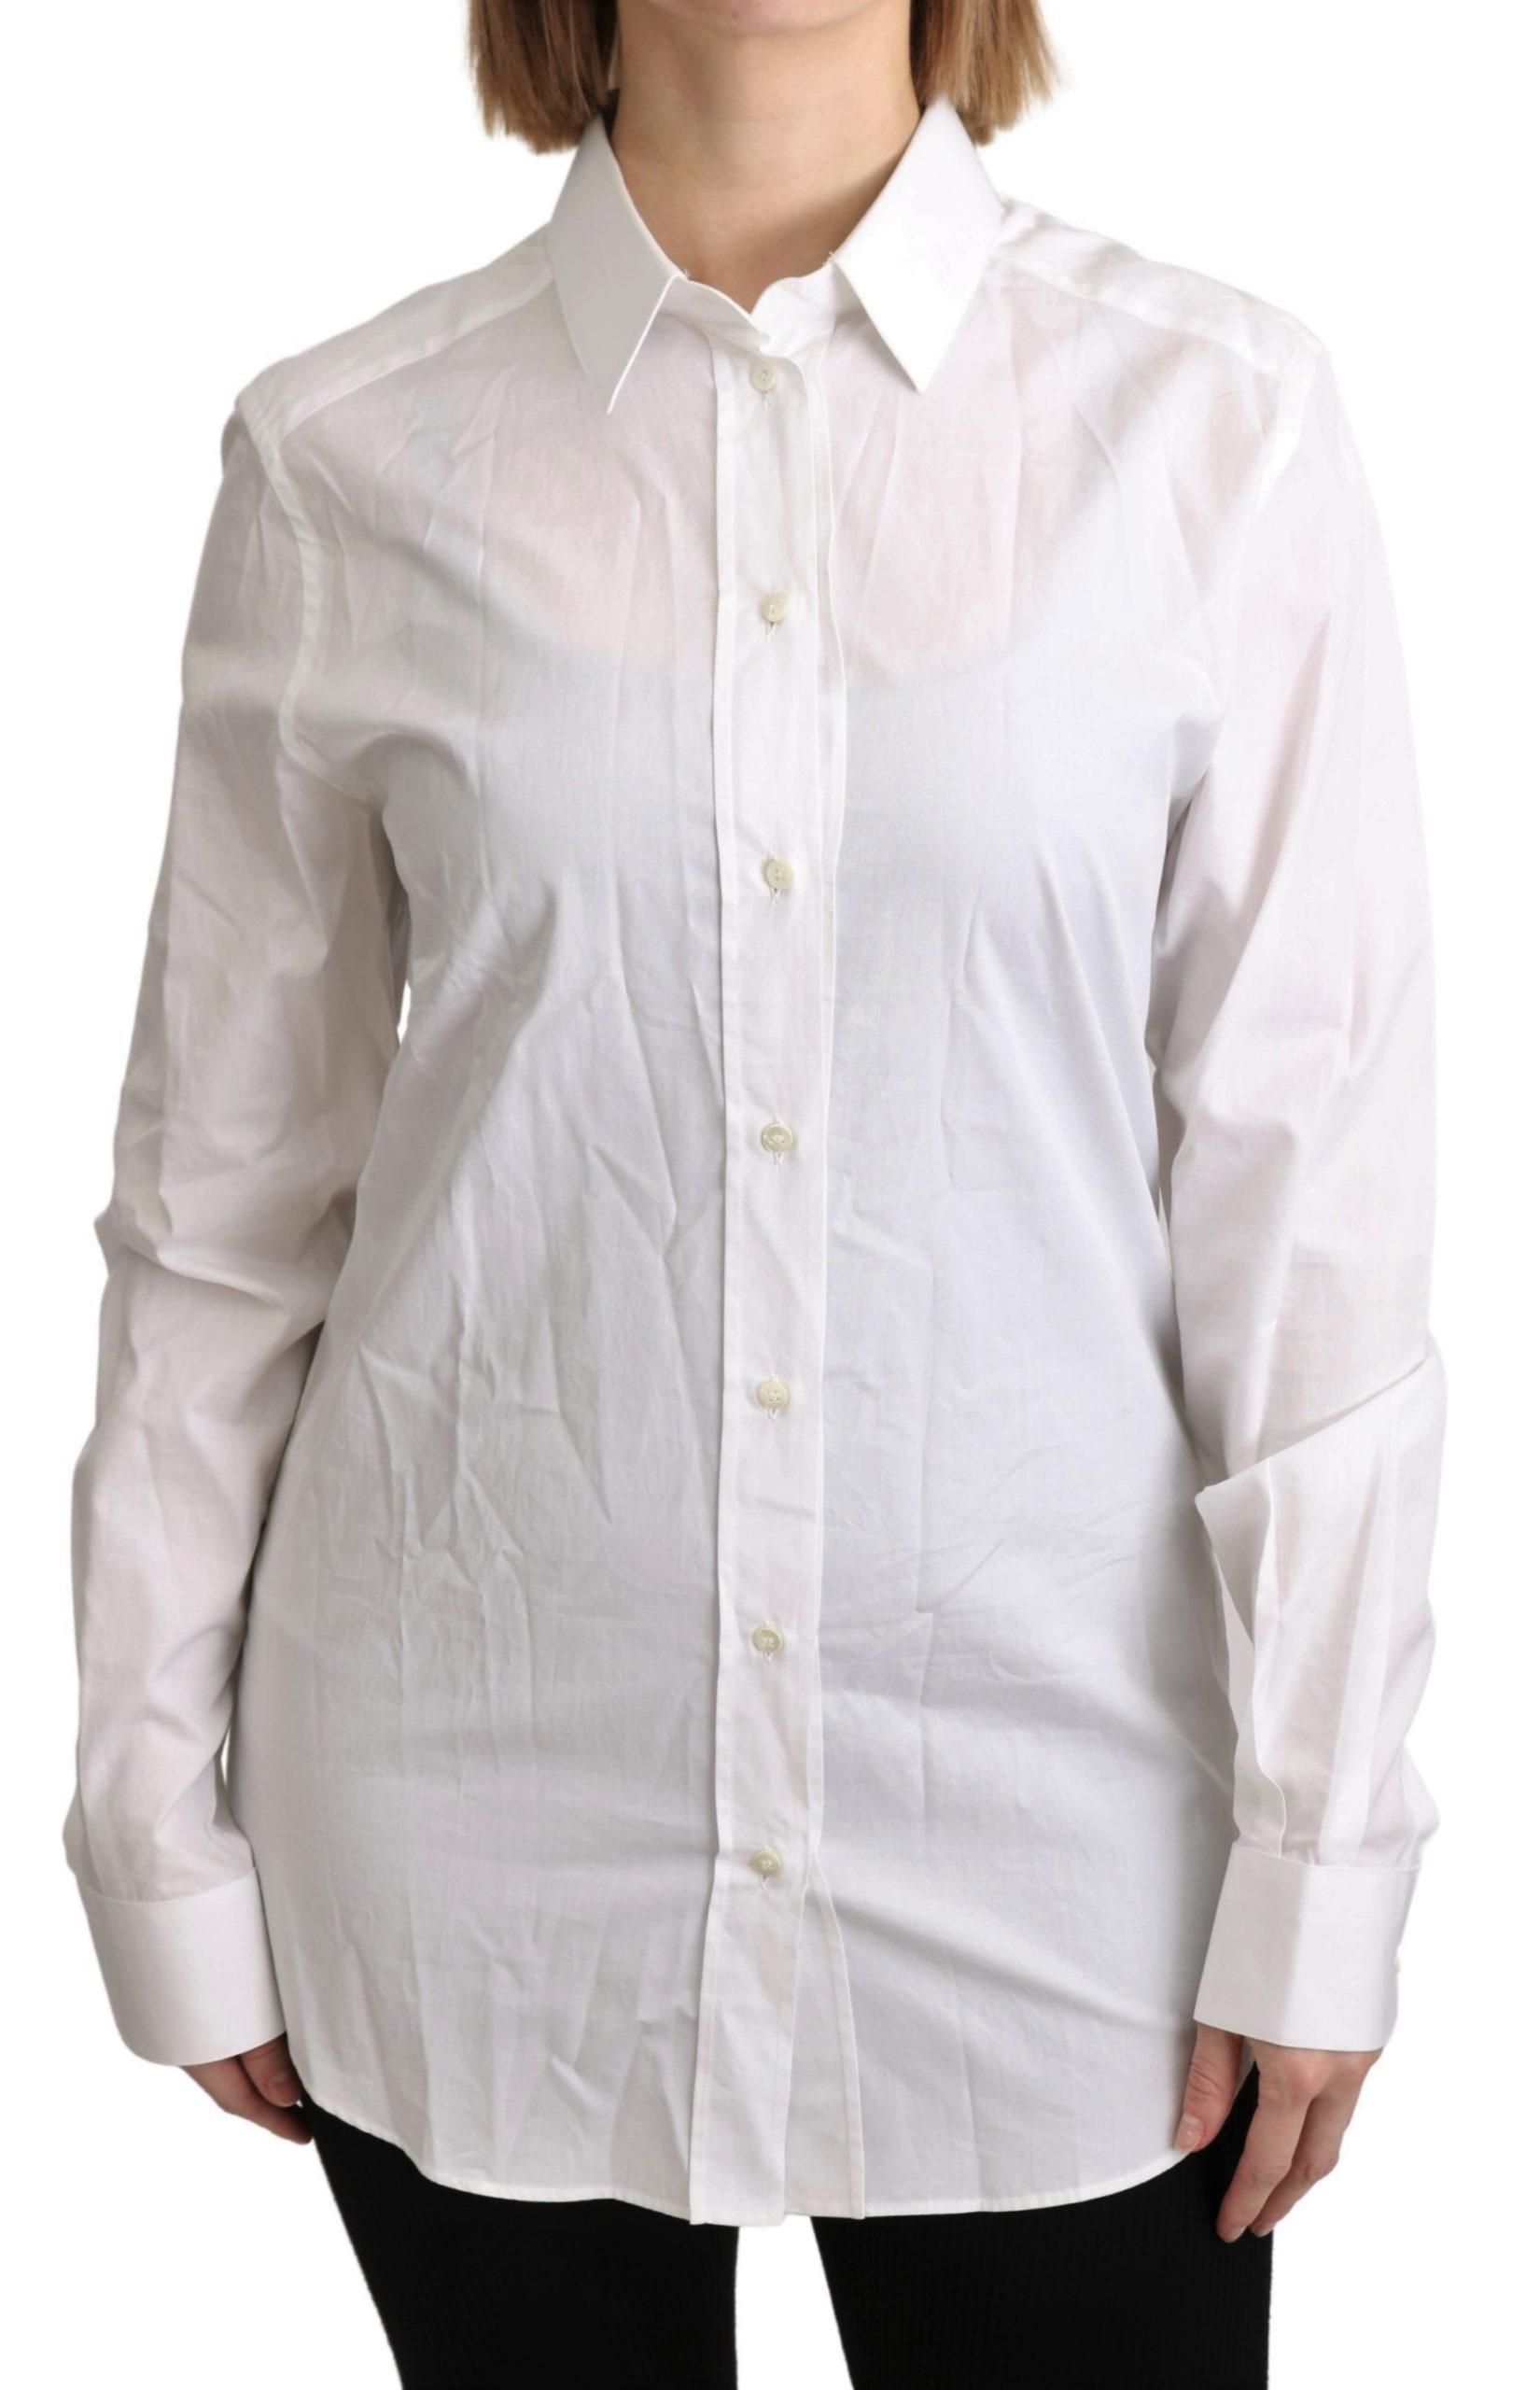 Dolce & Gabbana Women's Collared Formal Cotton Shirt White TSH4602 - IT36 | XS